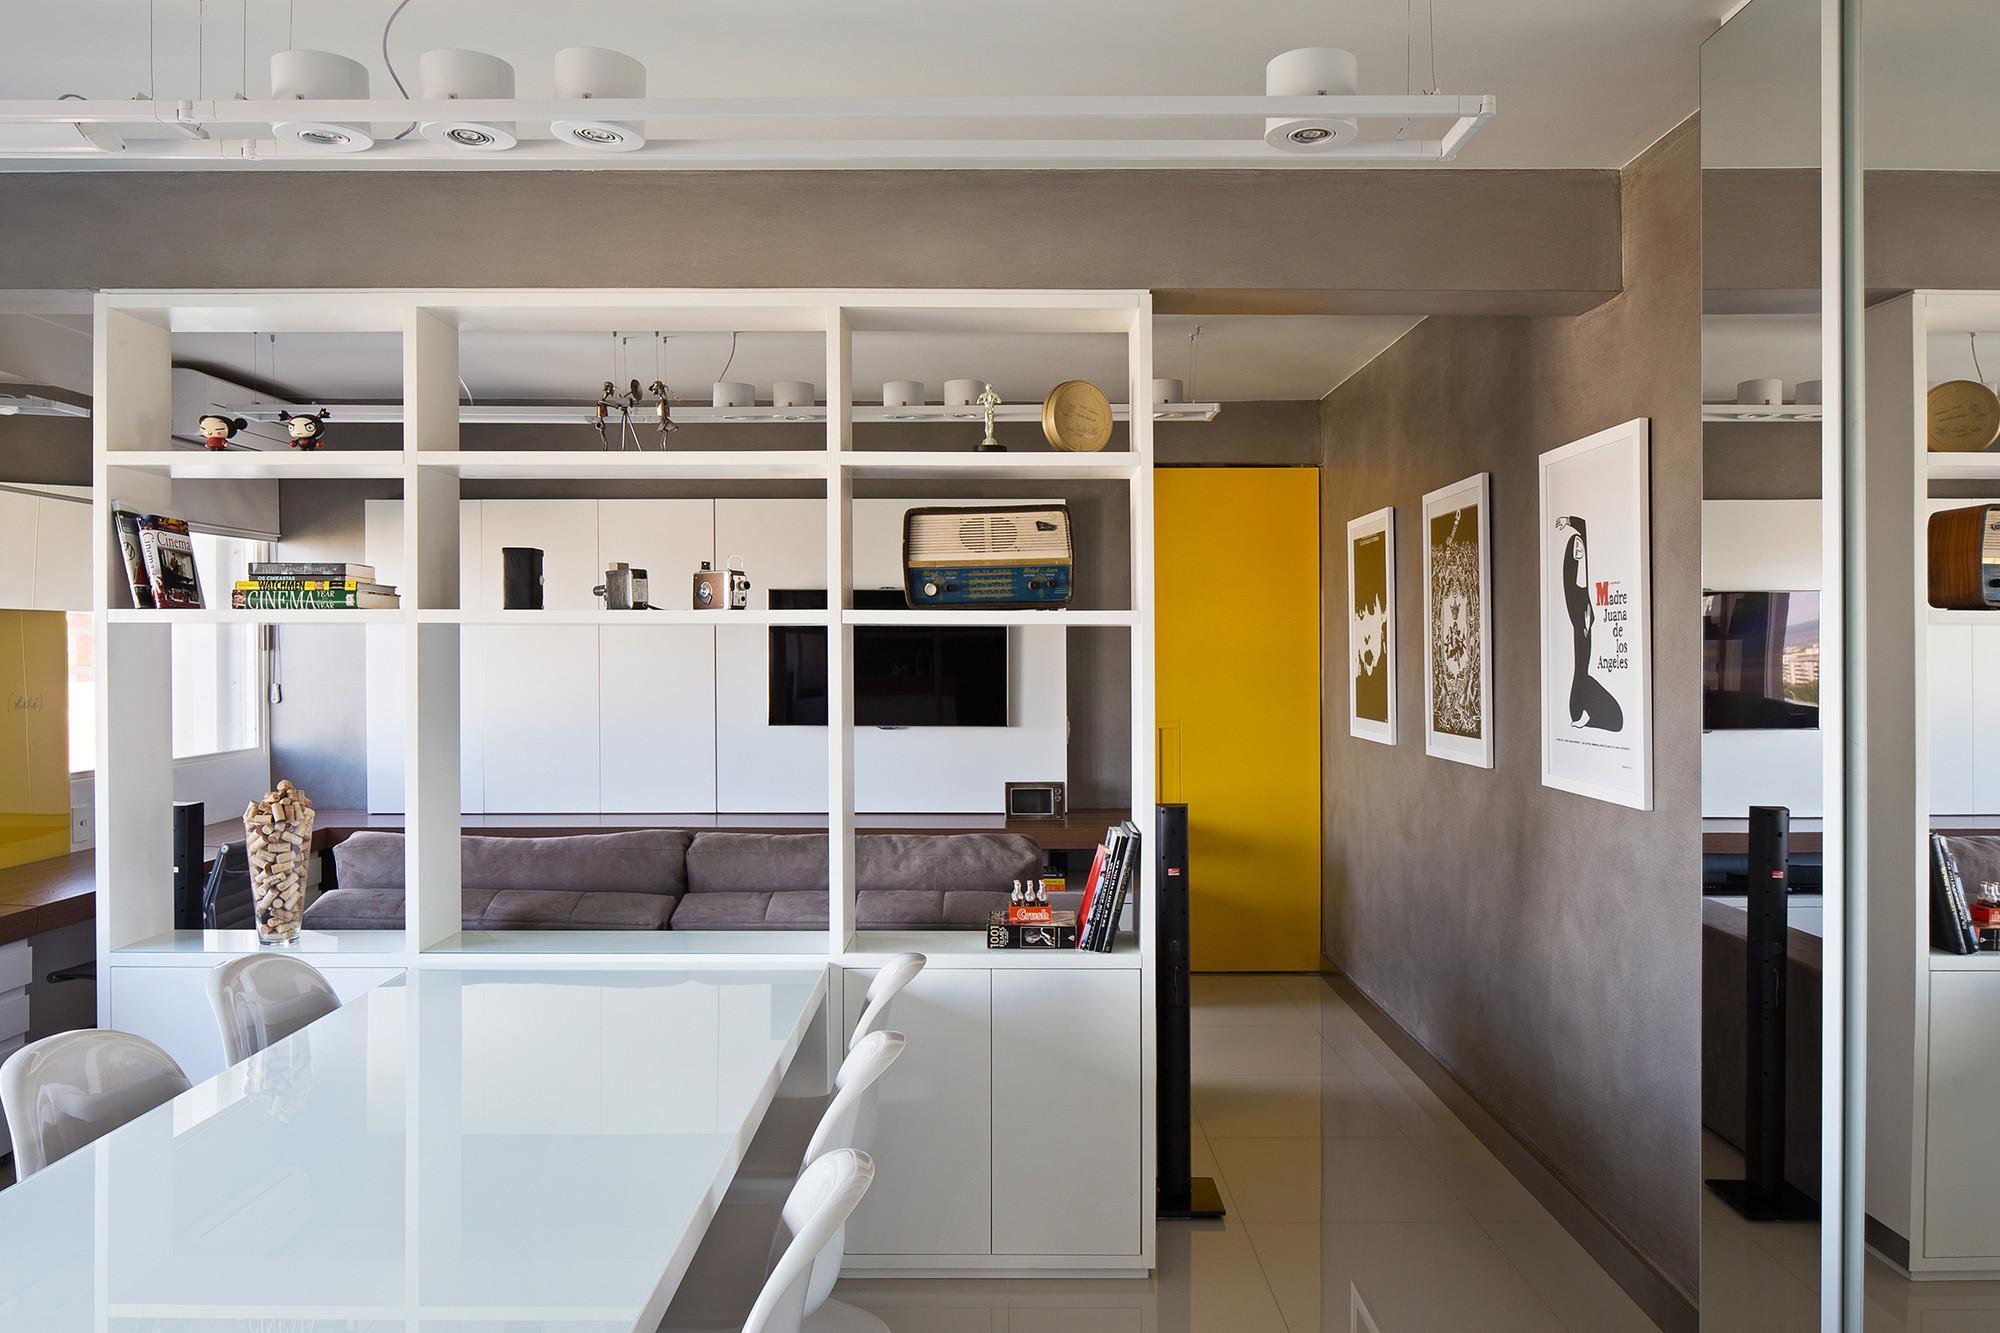 Apartamento MW / Albert Arquitetura + Flávia Chiari, © Haruo Mikami